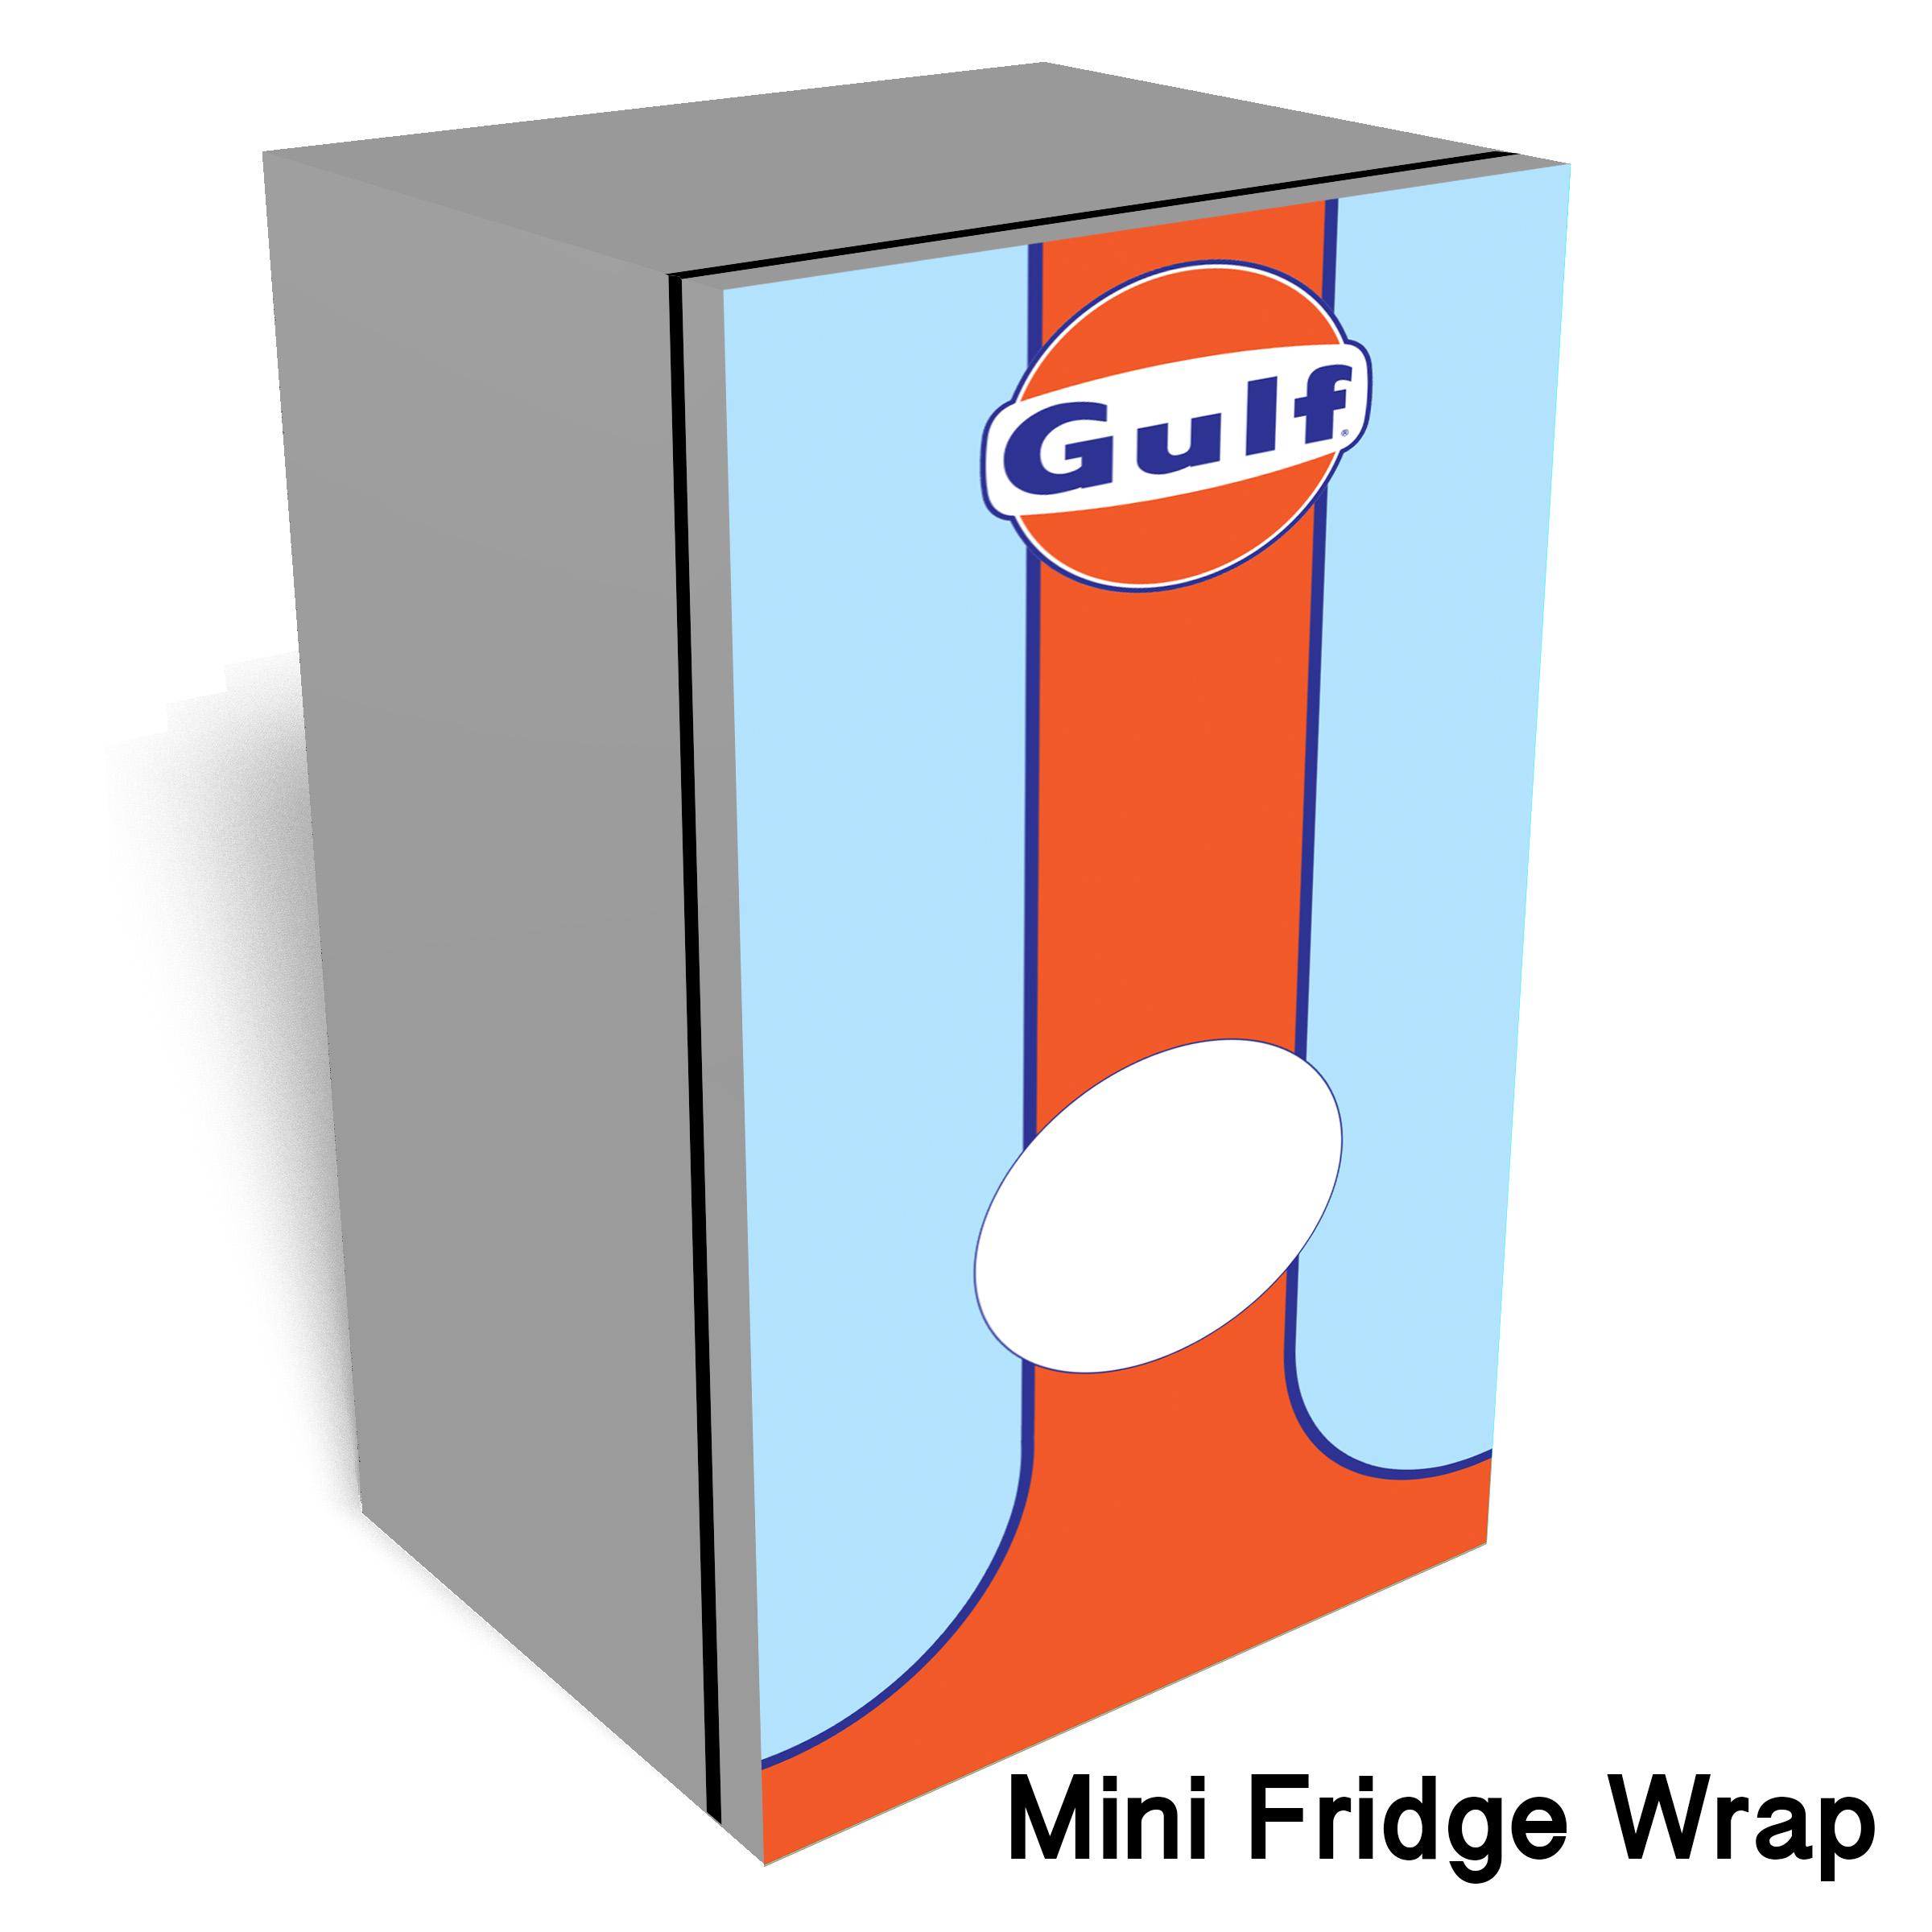 Gulf Race car Mini fridge wrap